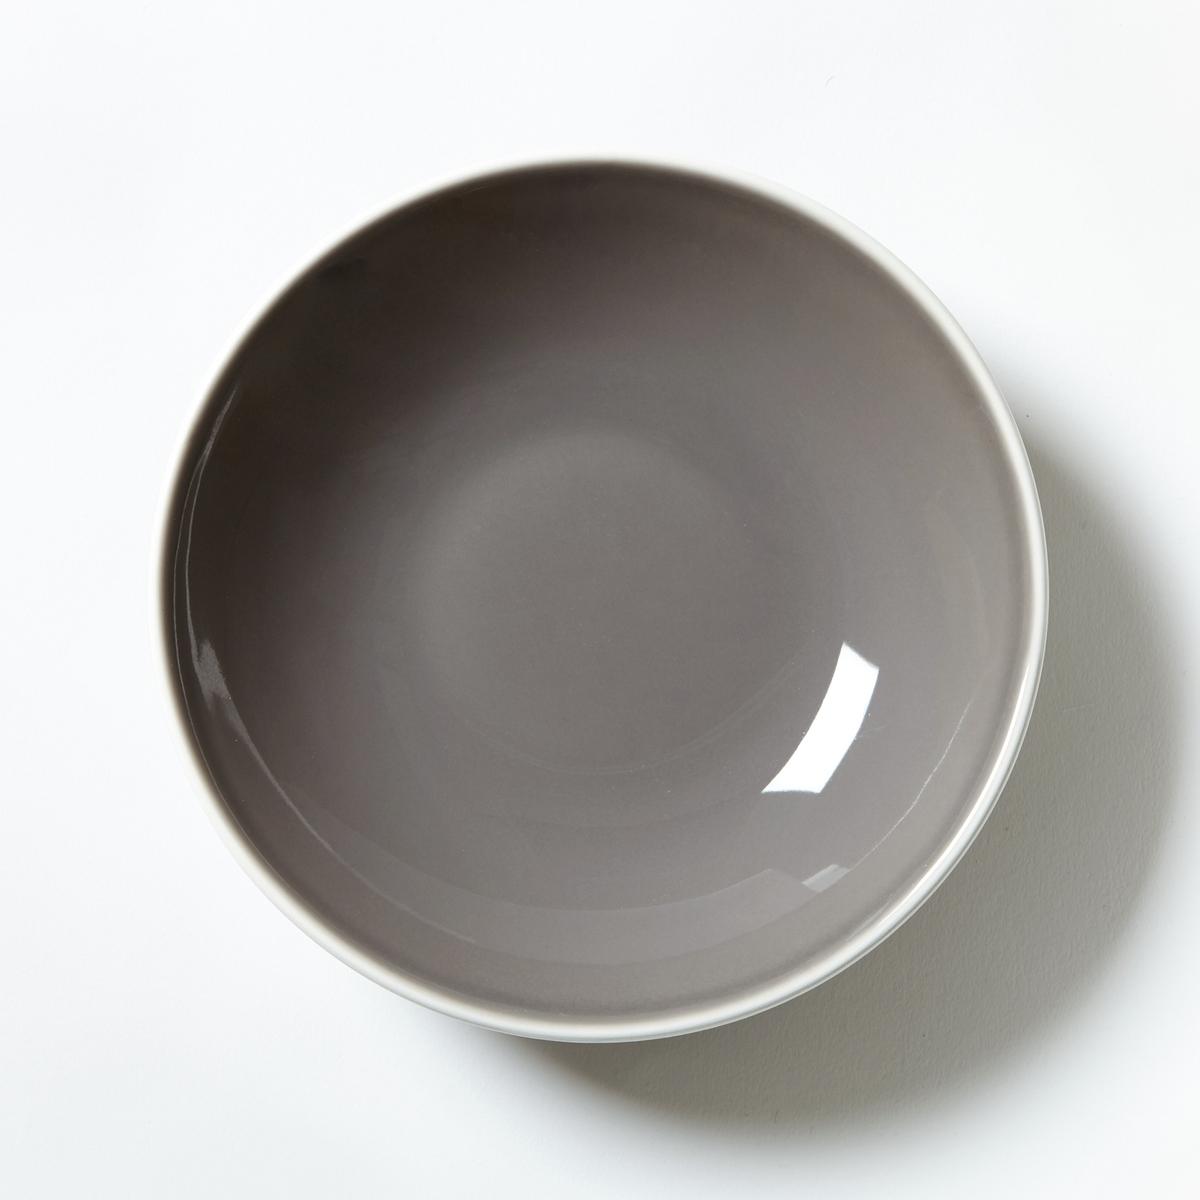 4 тарелки с дизайнерским рисунком от La Redoute